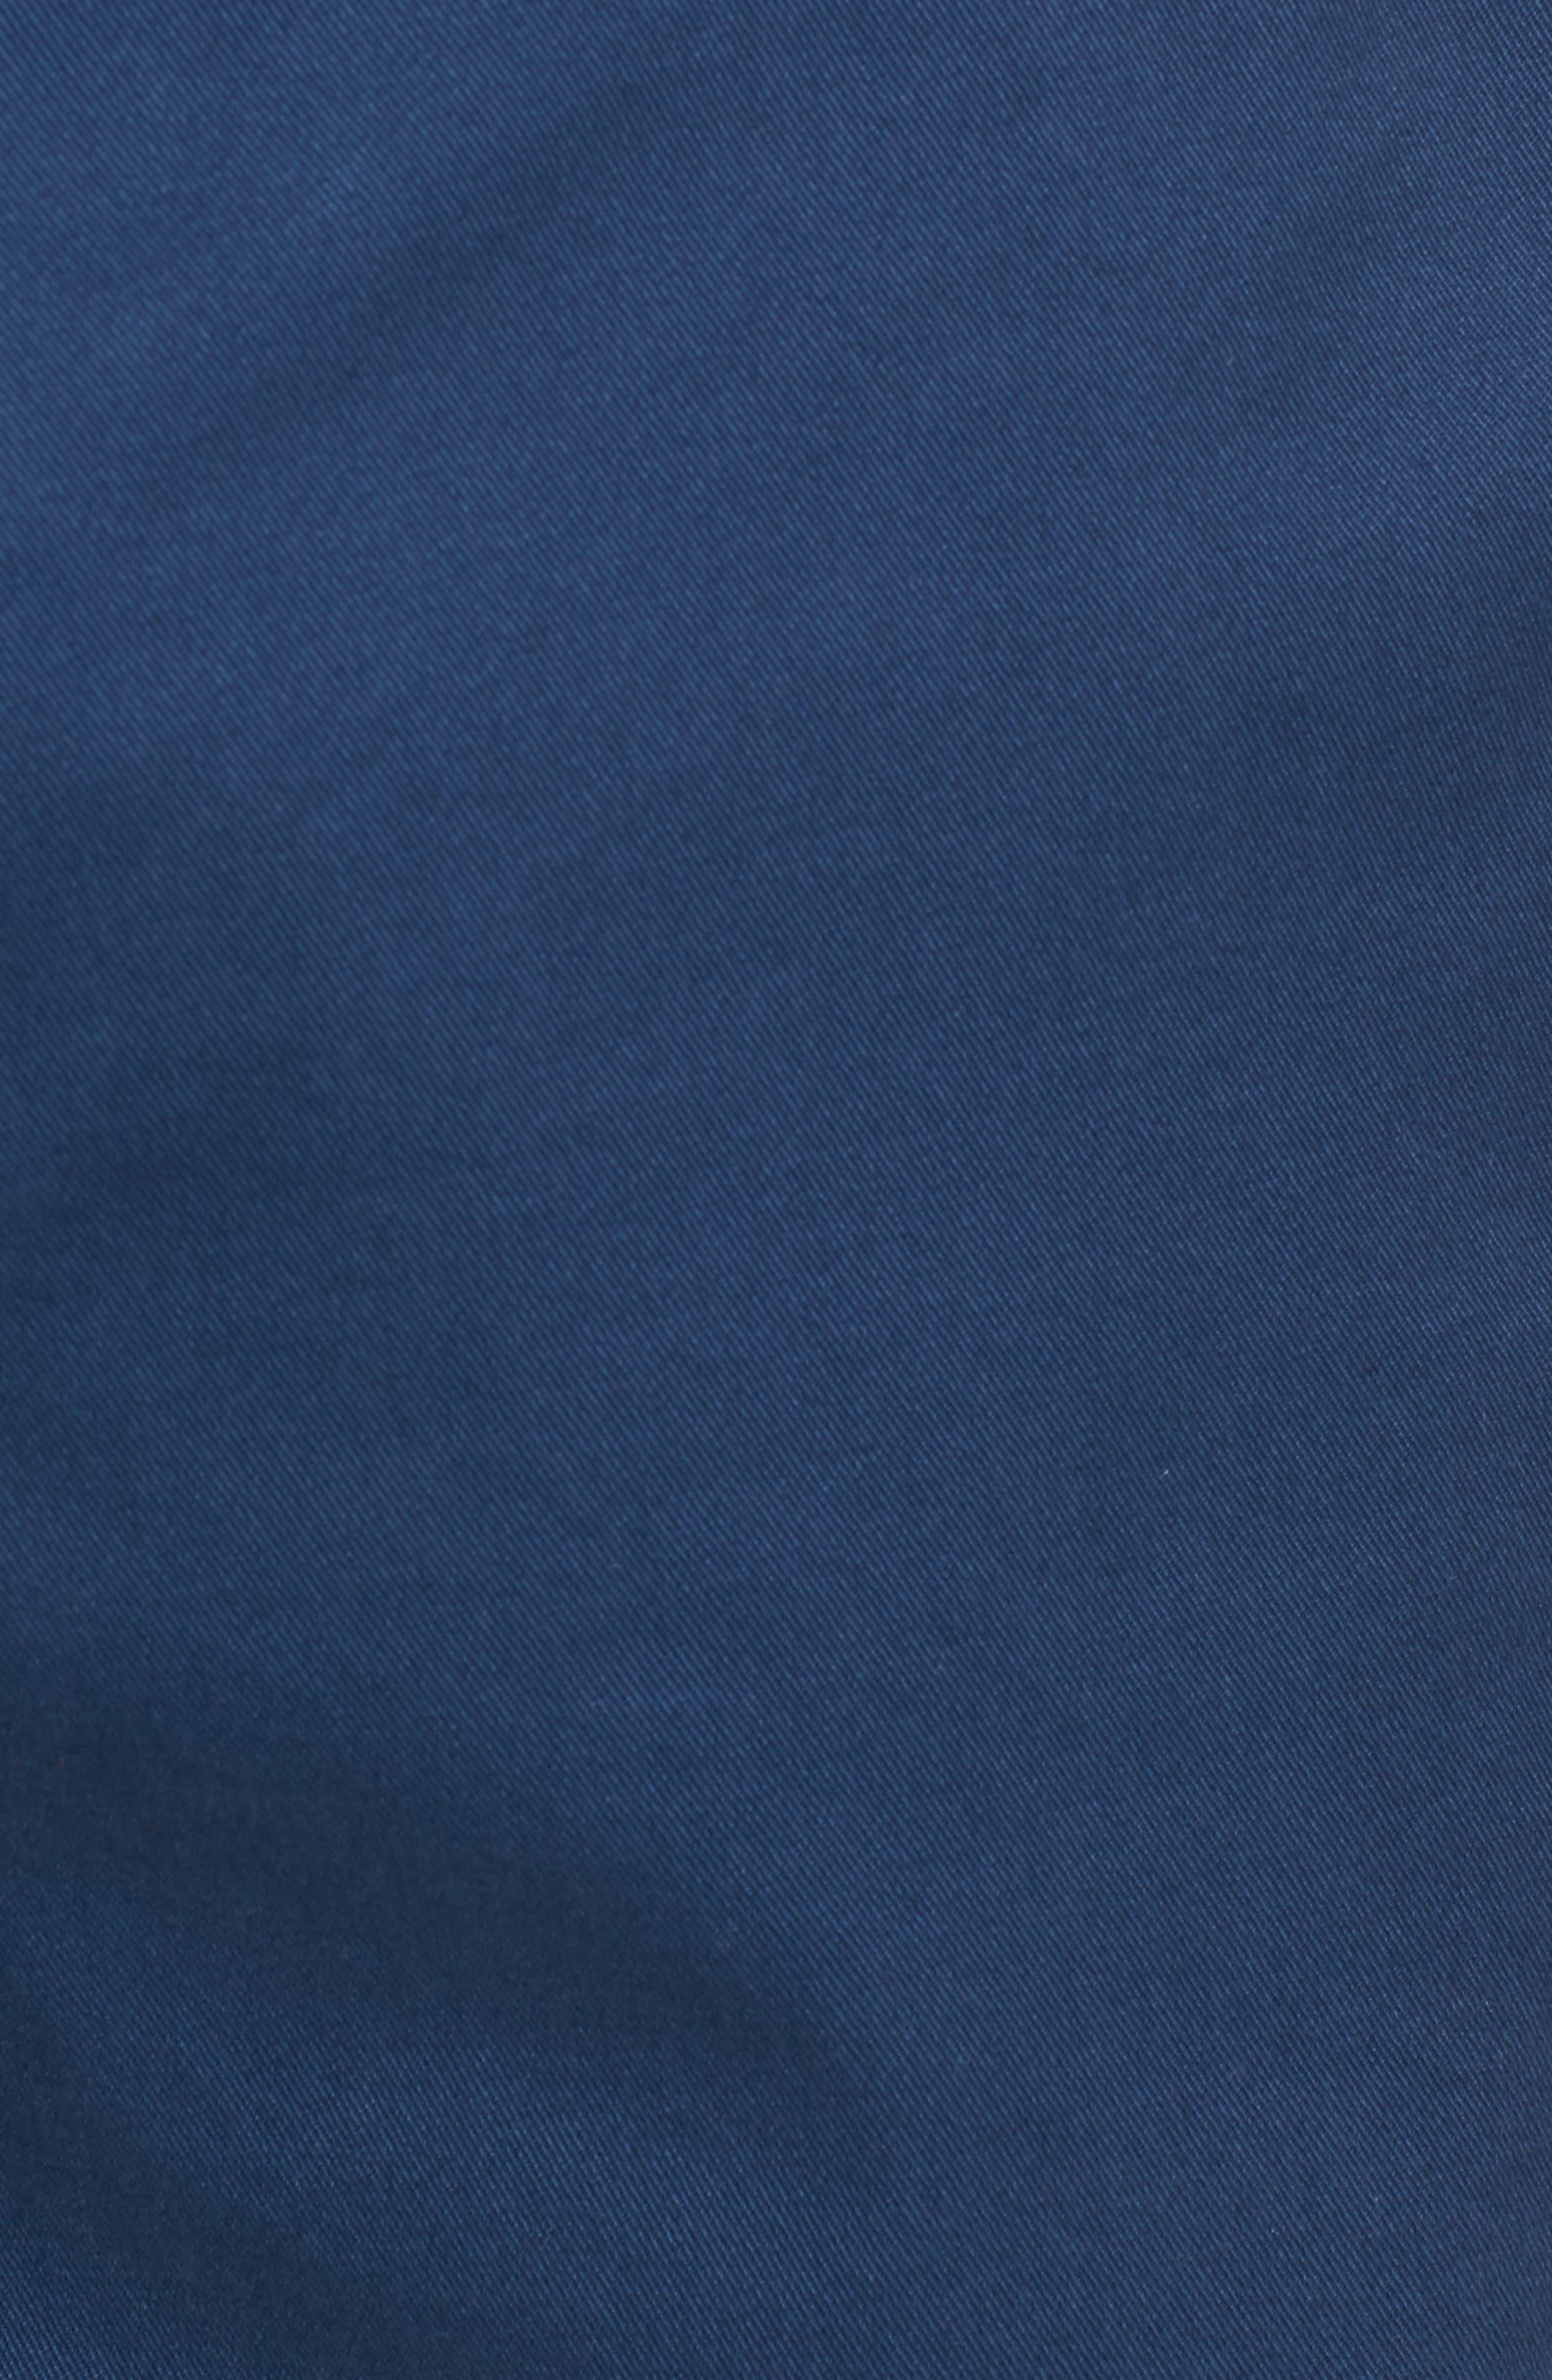 Proshor Slim Fit Chino Shorts,                             Alternate thumbnail 5, color,                             Dark Blue